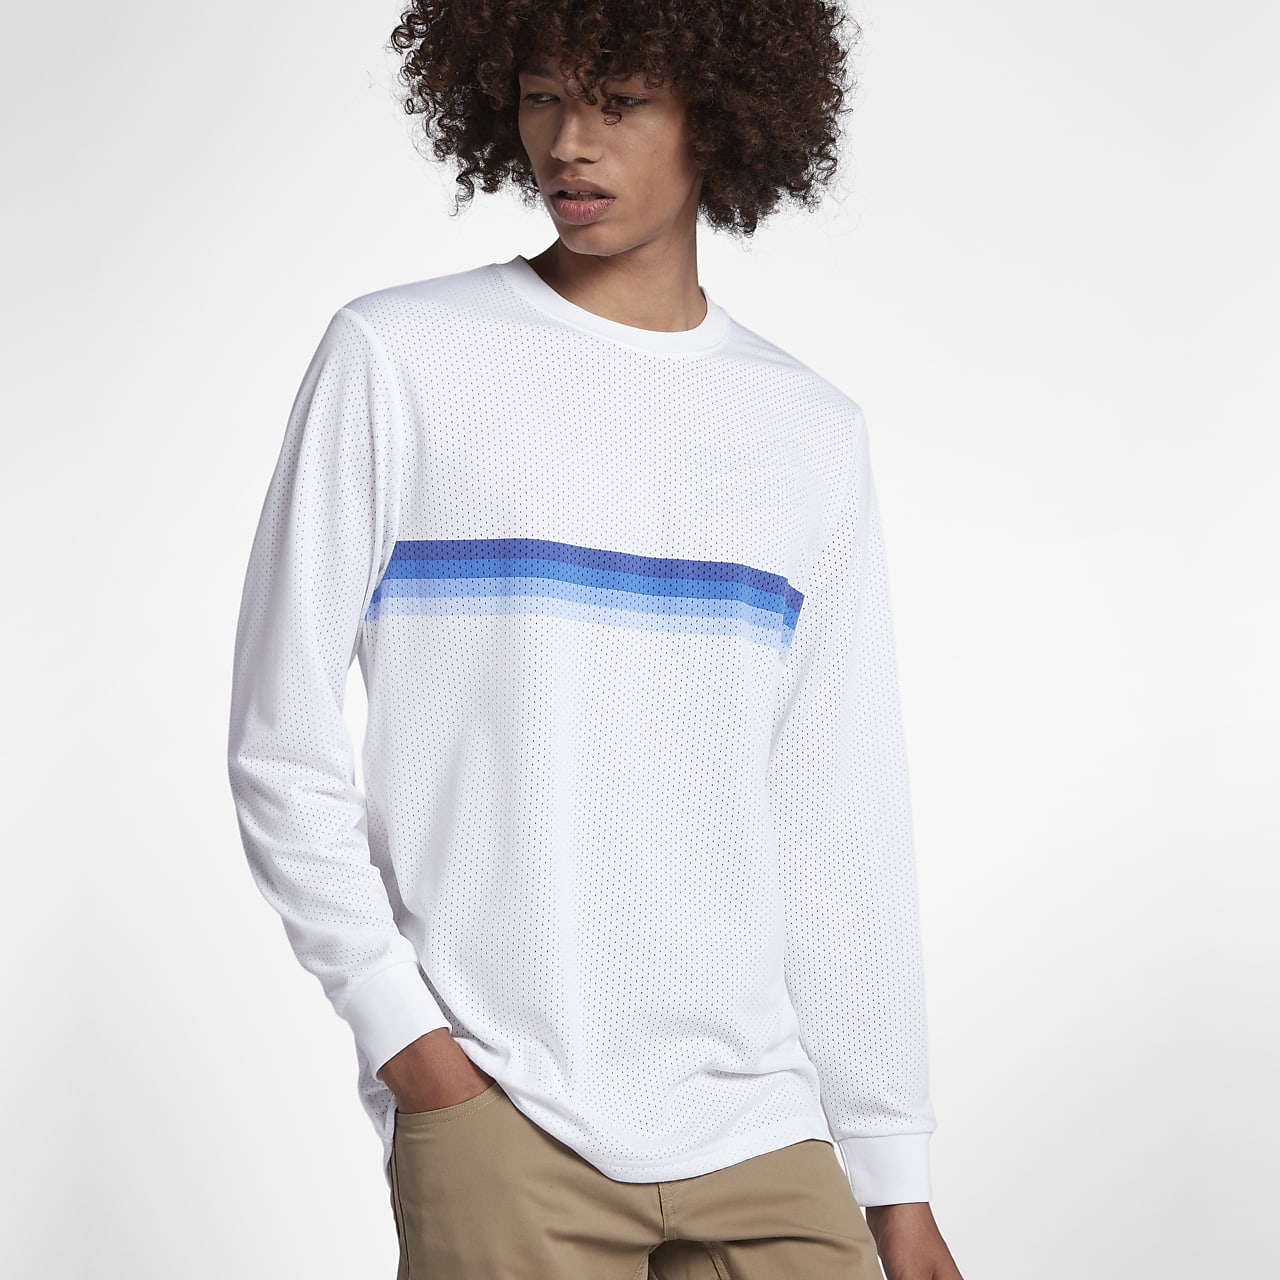 Nike SB x Quartersnacks Dri-FIT Men's Long-Sleeve Skateboarding Top